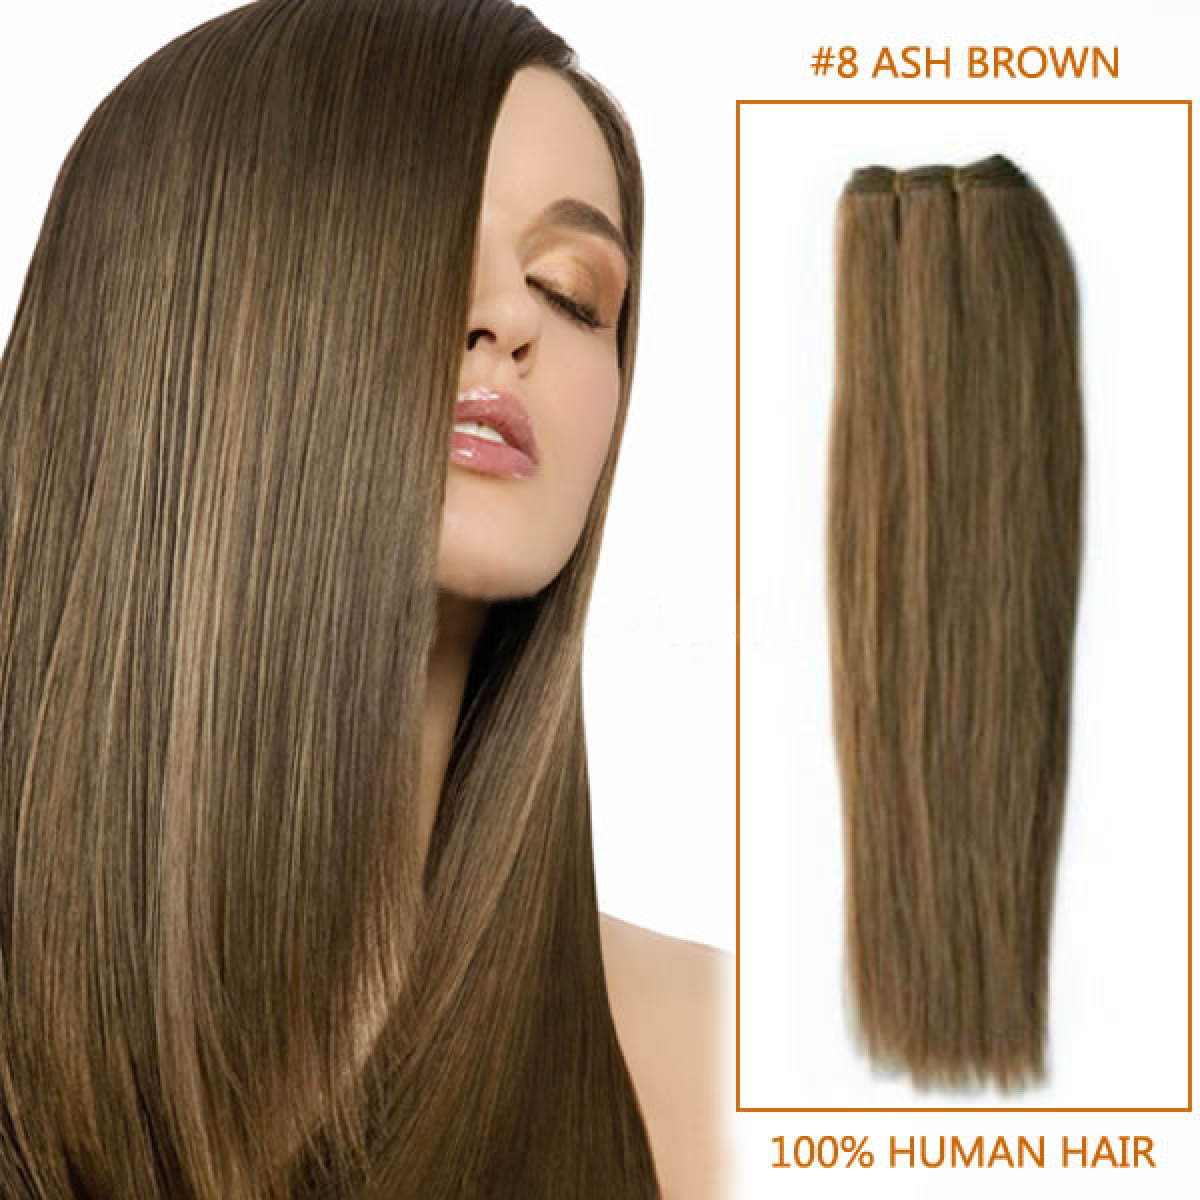 16 Inch #8 Ash Brown Straight Brazilian Virgin Hair Wefts